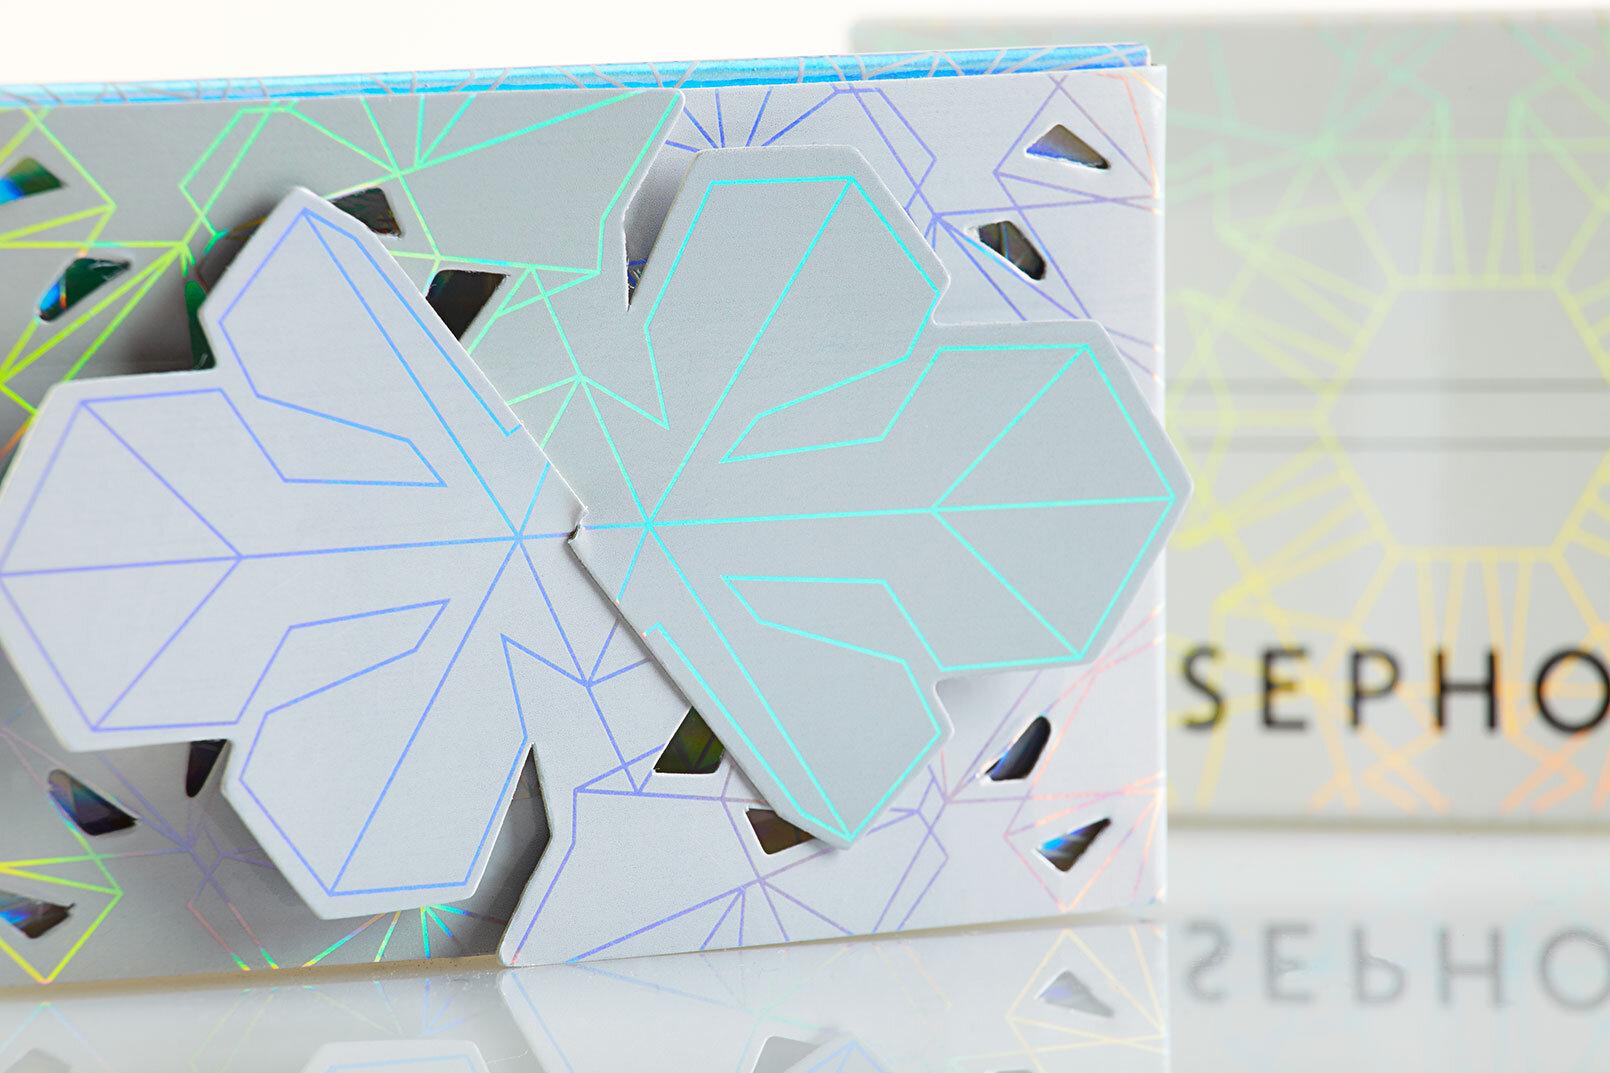 Sephora-Box-Packaging-Design-company-5.jpg